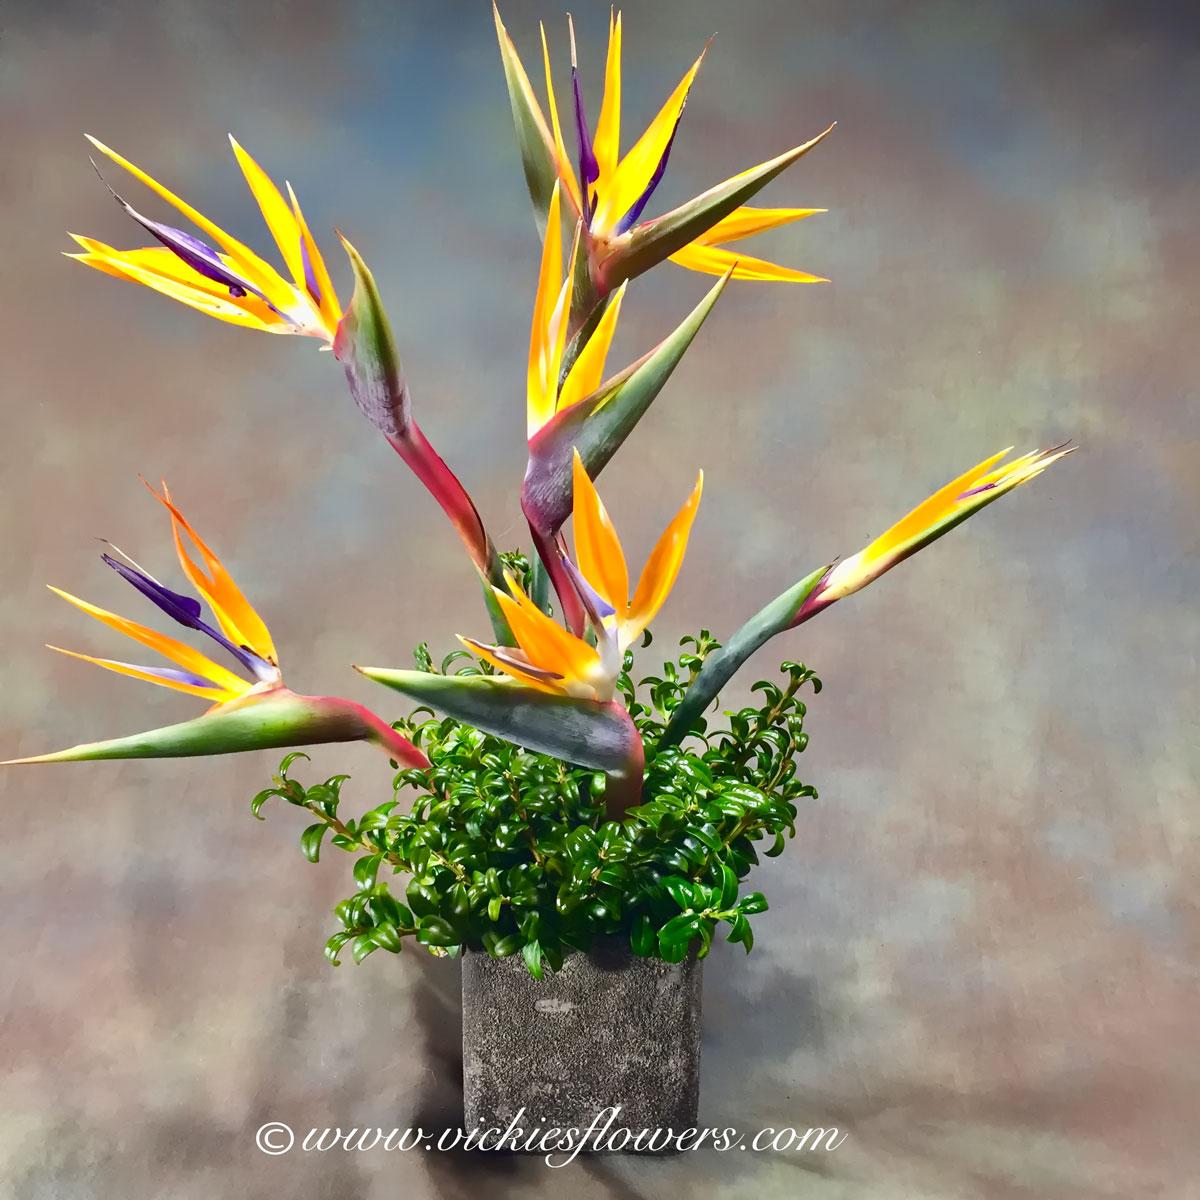 Ikebana asian flower arrangements vickies flowers brighton co ikebana oriental flowers ib 036 85 plus tax and delivery oriental and ikebana inspired birds of paradise in stone vase buycottarizona